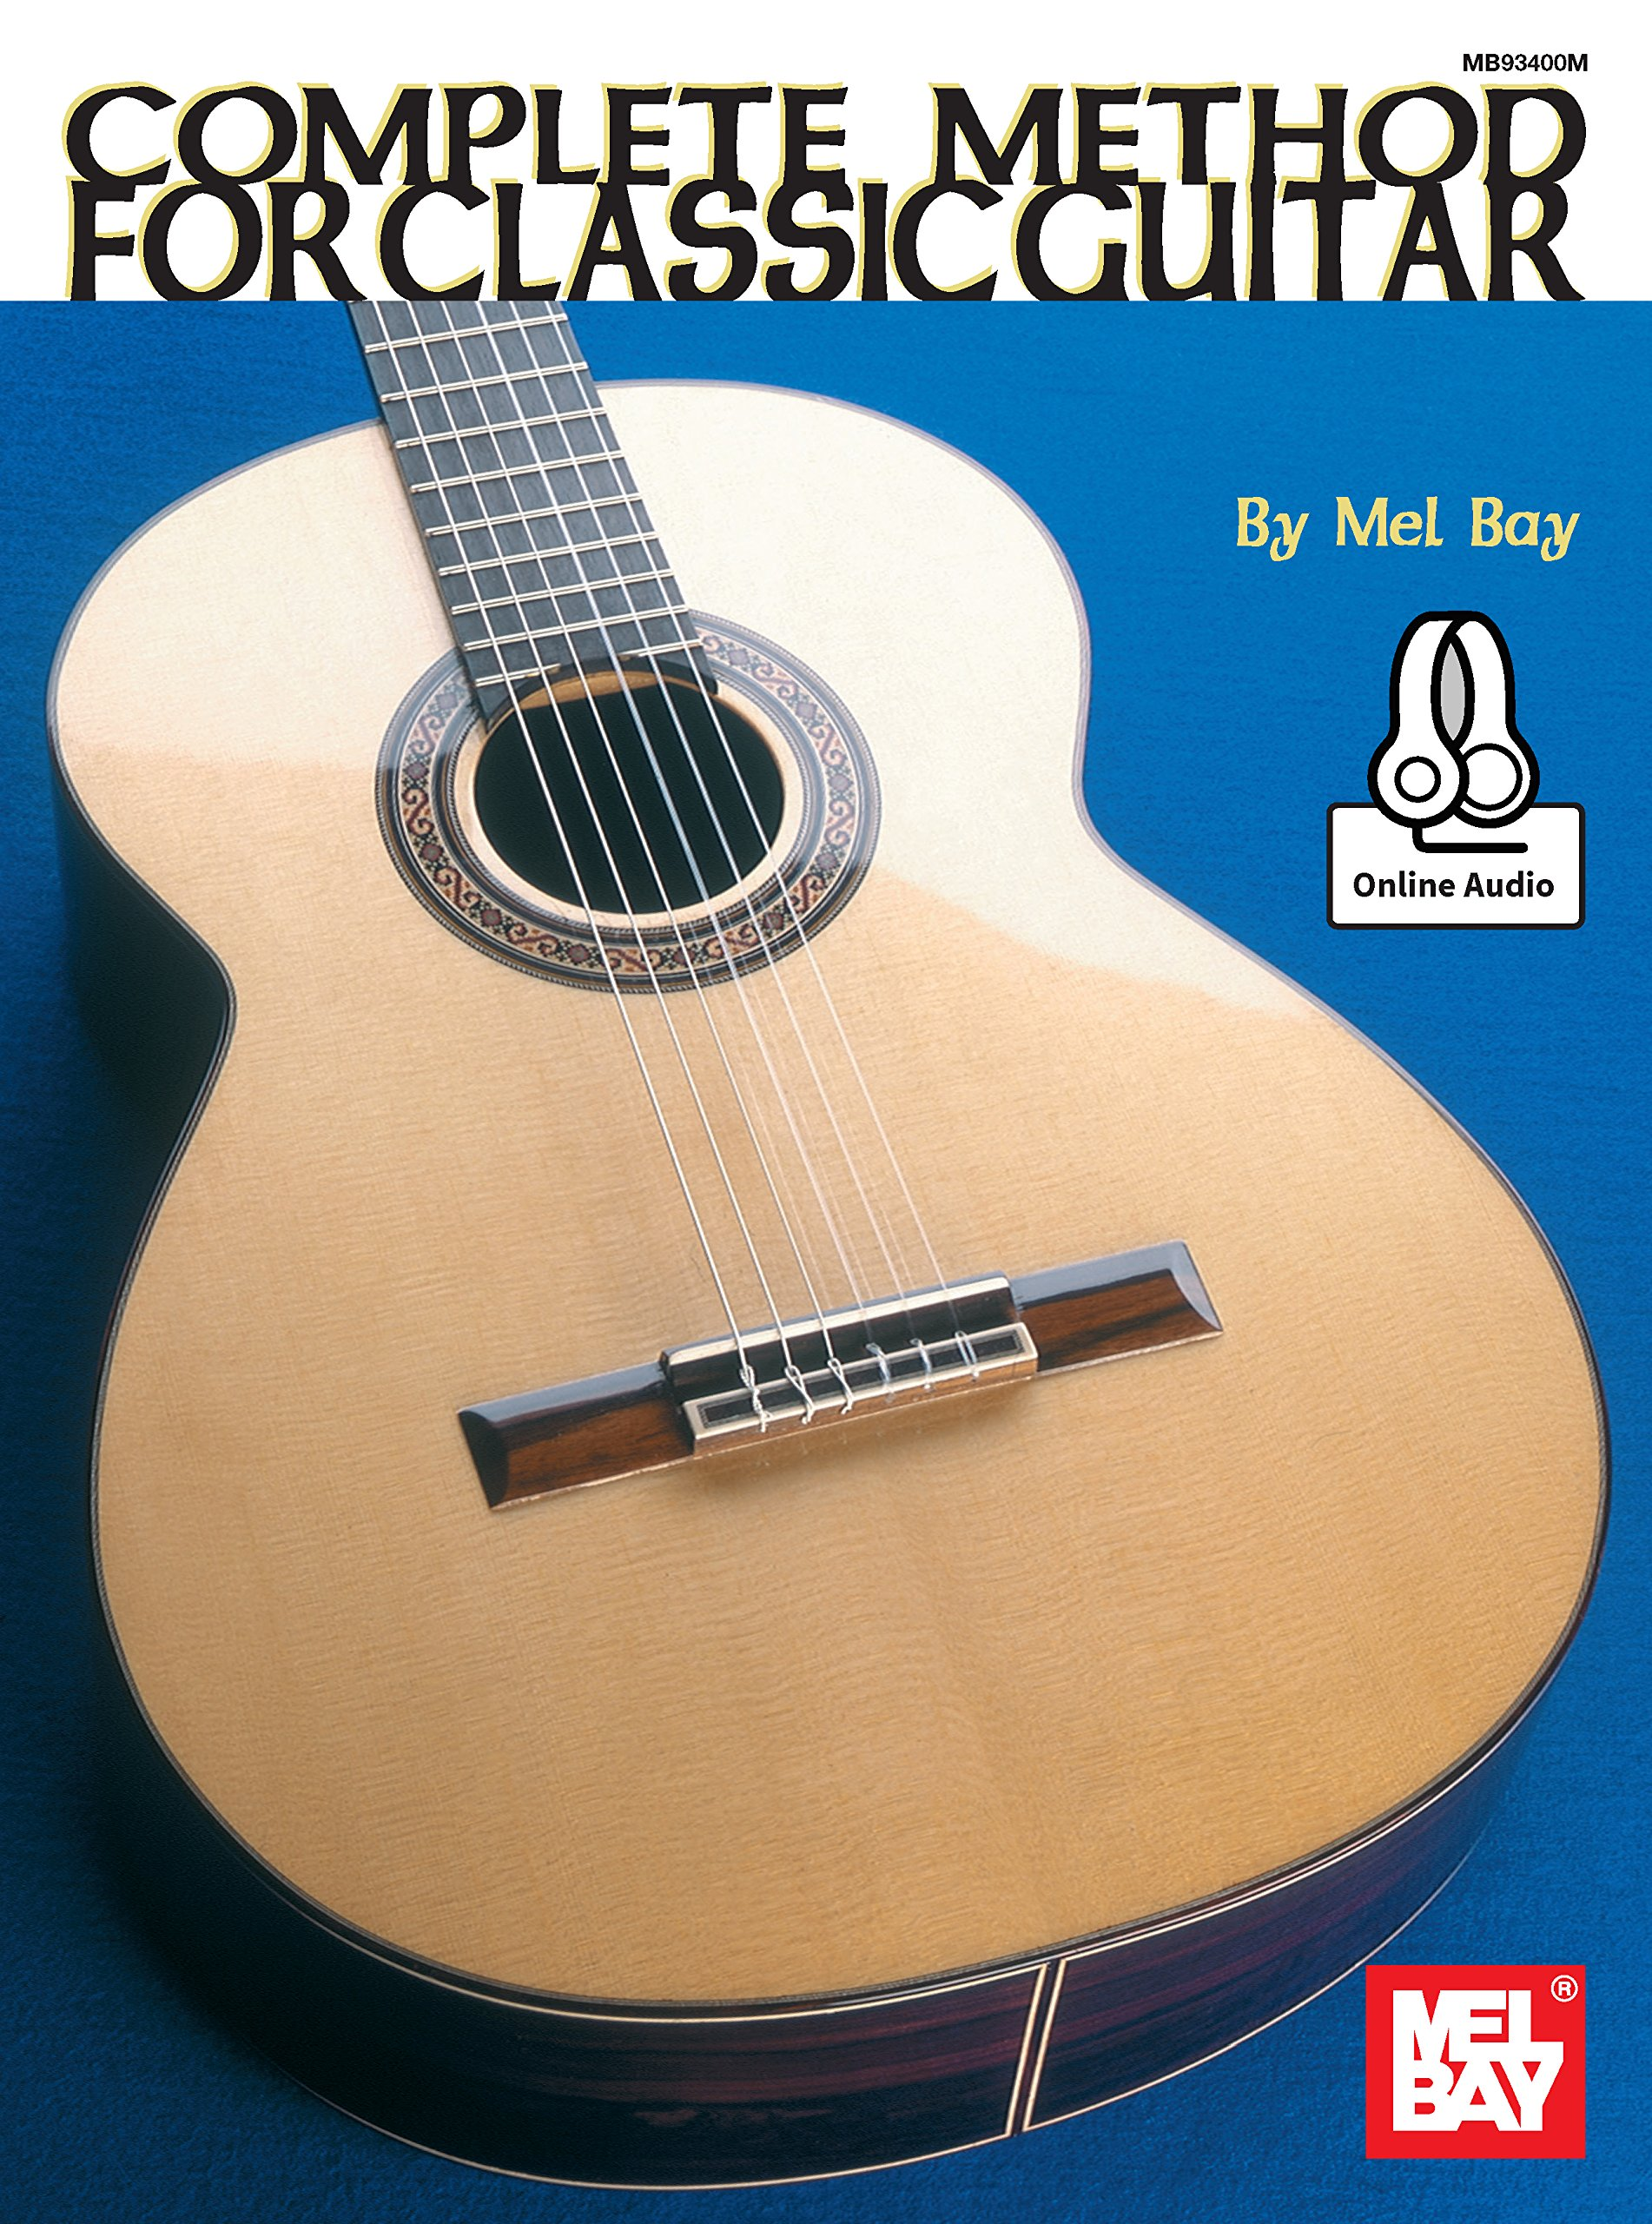 Complete Method For Classic Guitar Mel Bay 9780786698325 Amazon The Secret Teacher Dounloadable Courses Beginners Books